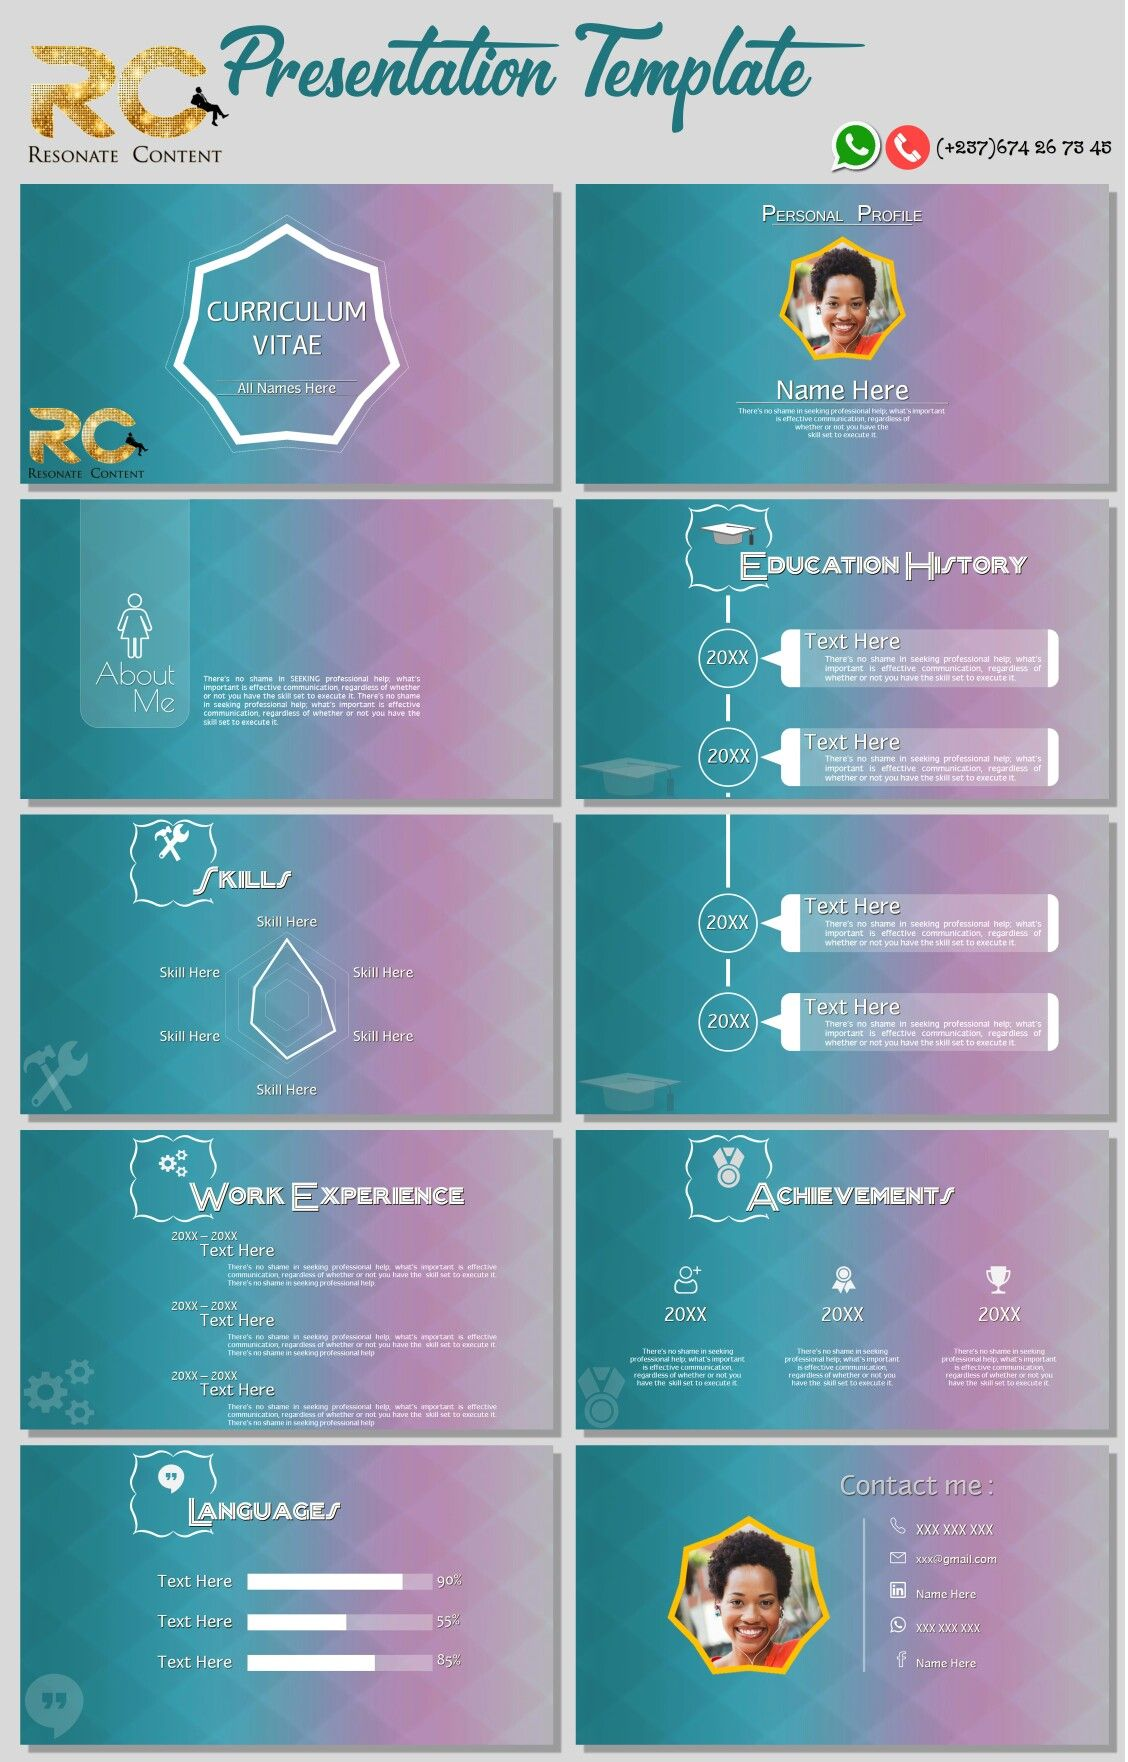 CV PowerPoint Template CV PowerPoint template RC